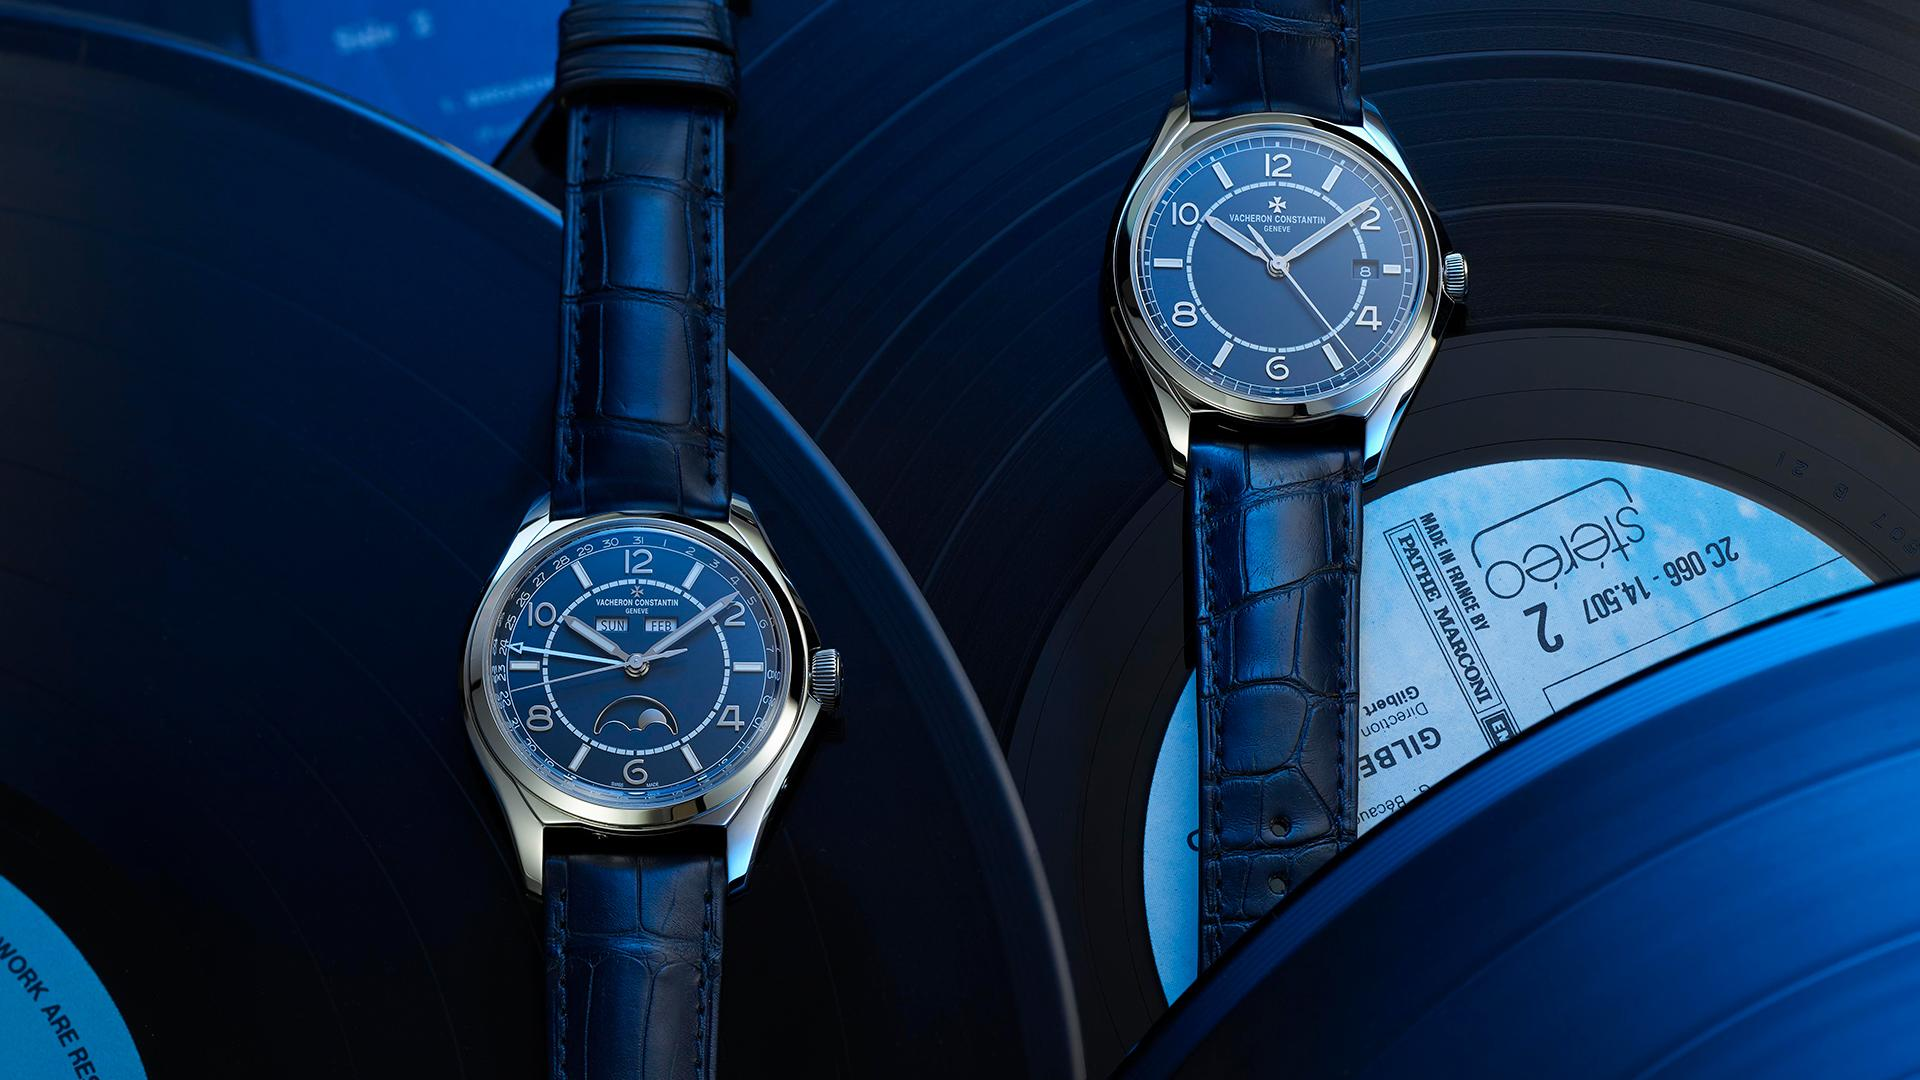 Vacheron Constantin FiftySix watch collection